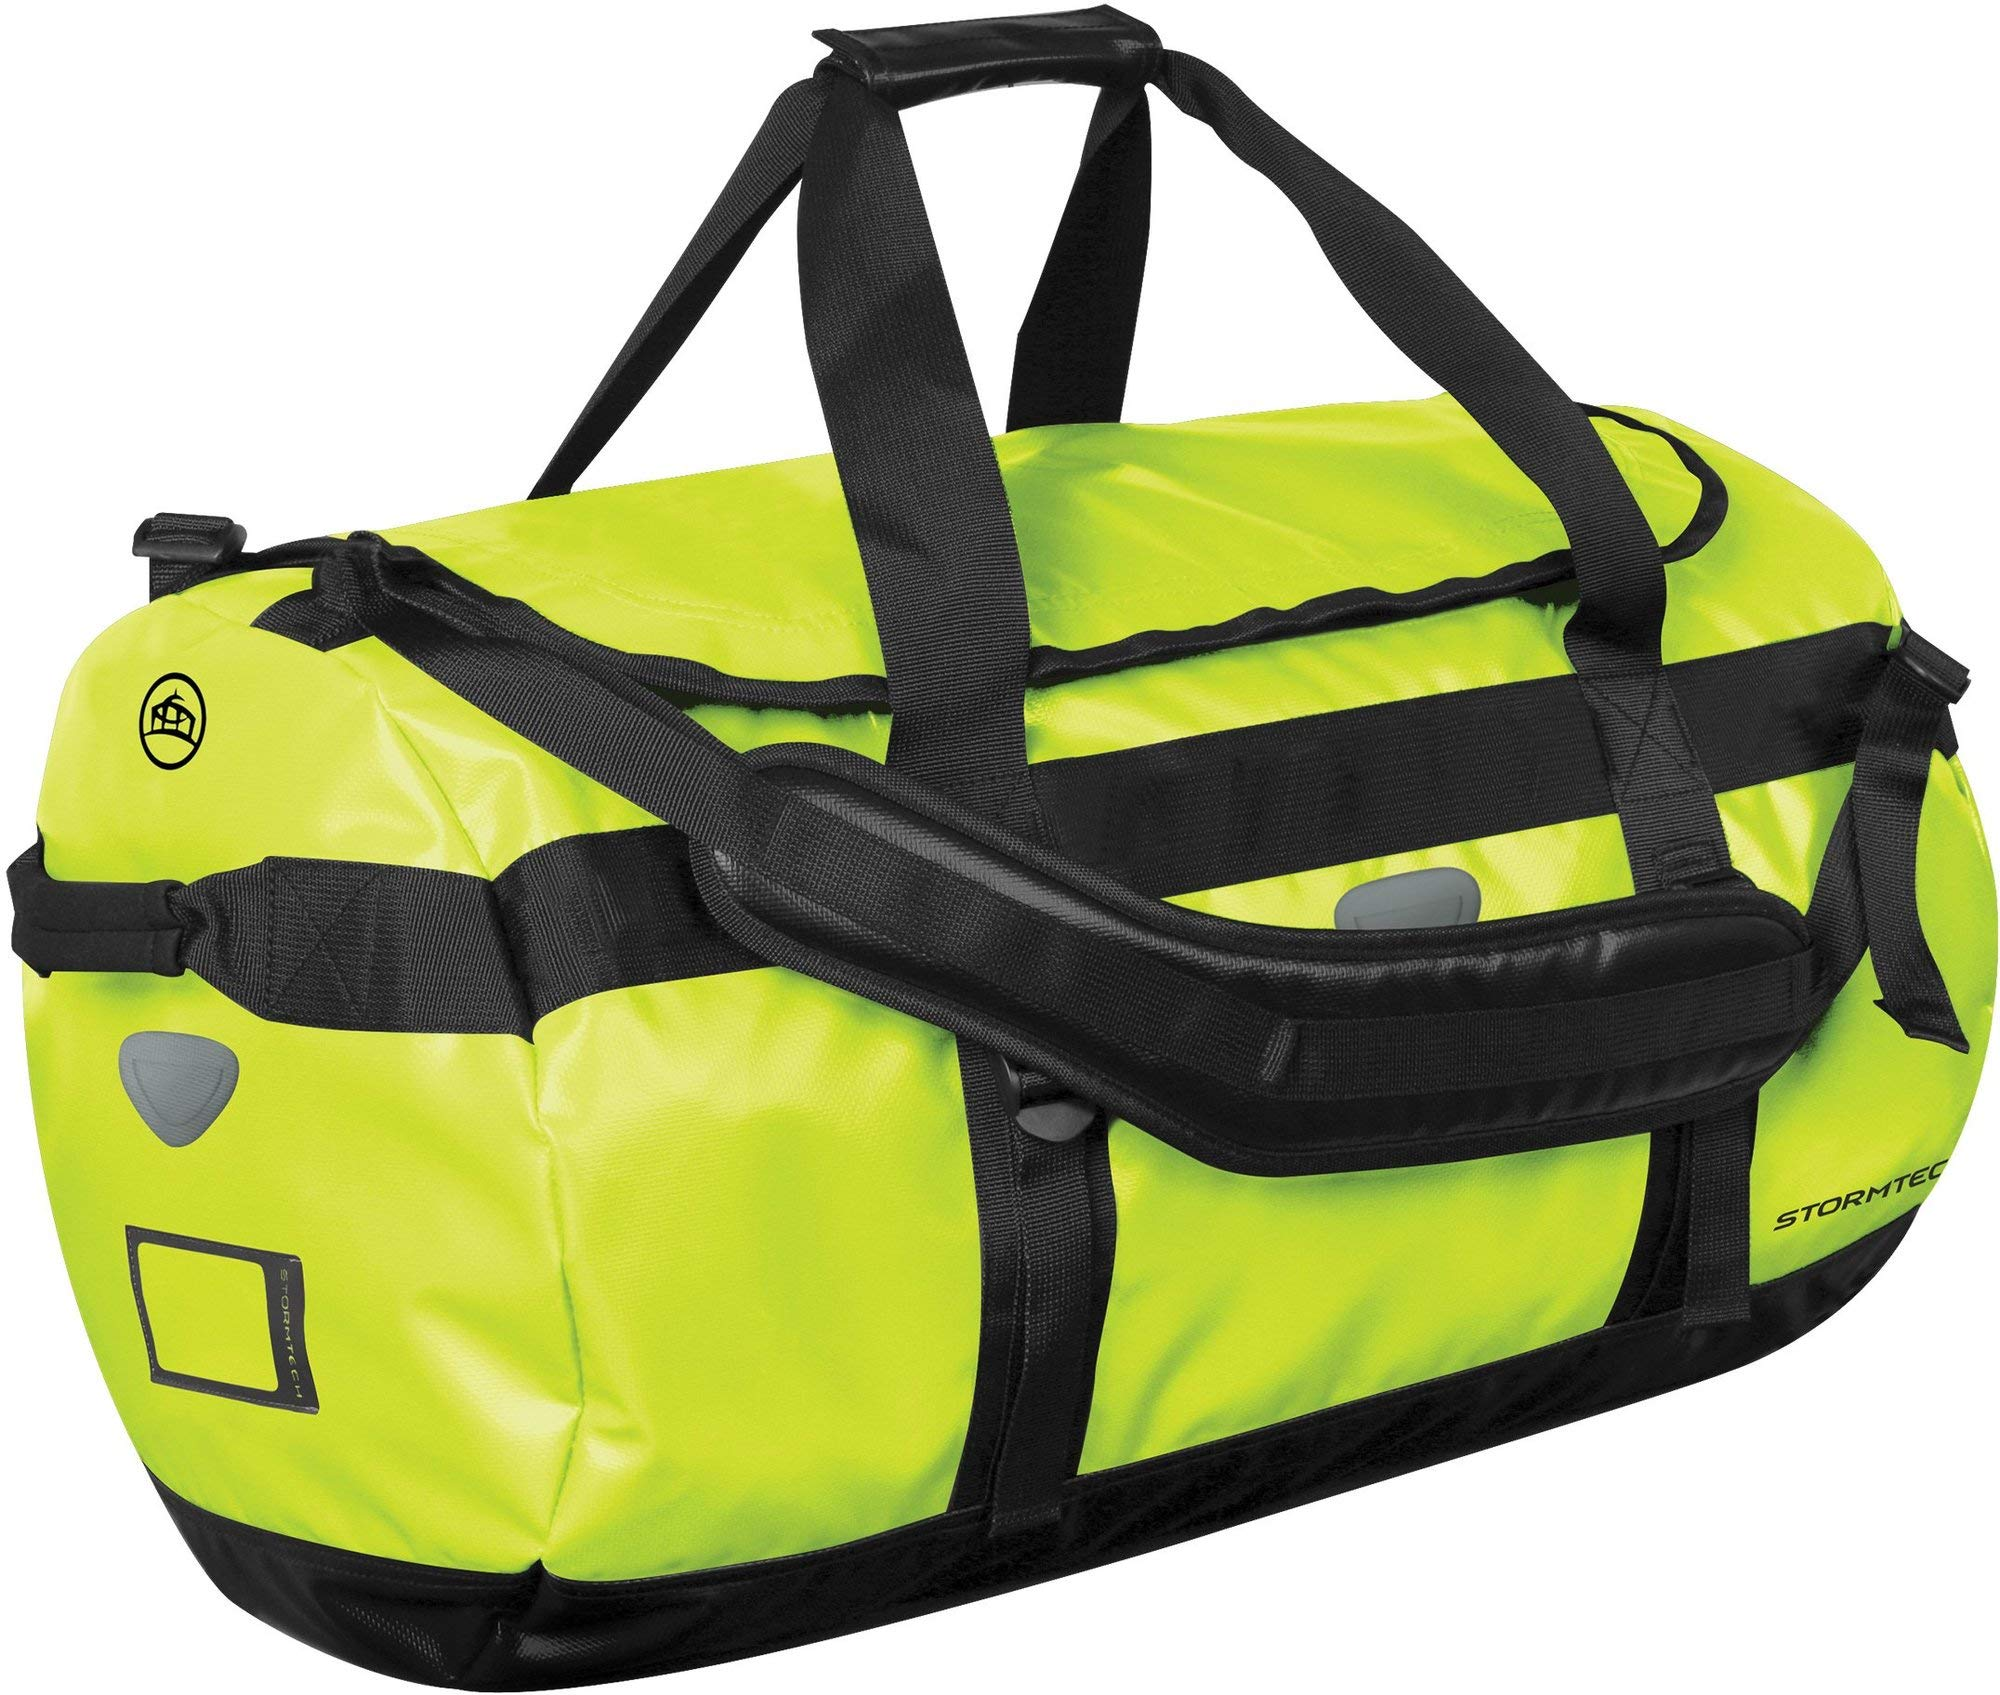 Stormtech Atlantis Large Waterproof Gear Bag Hi Vis Green